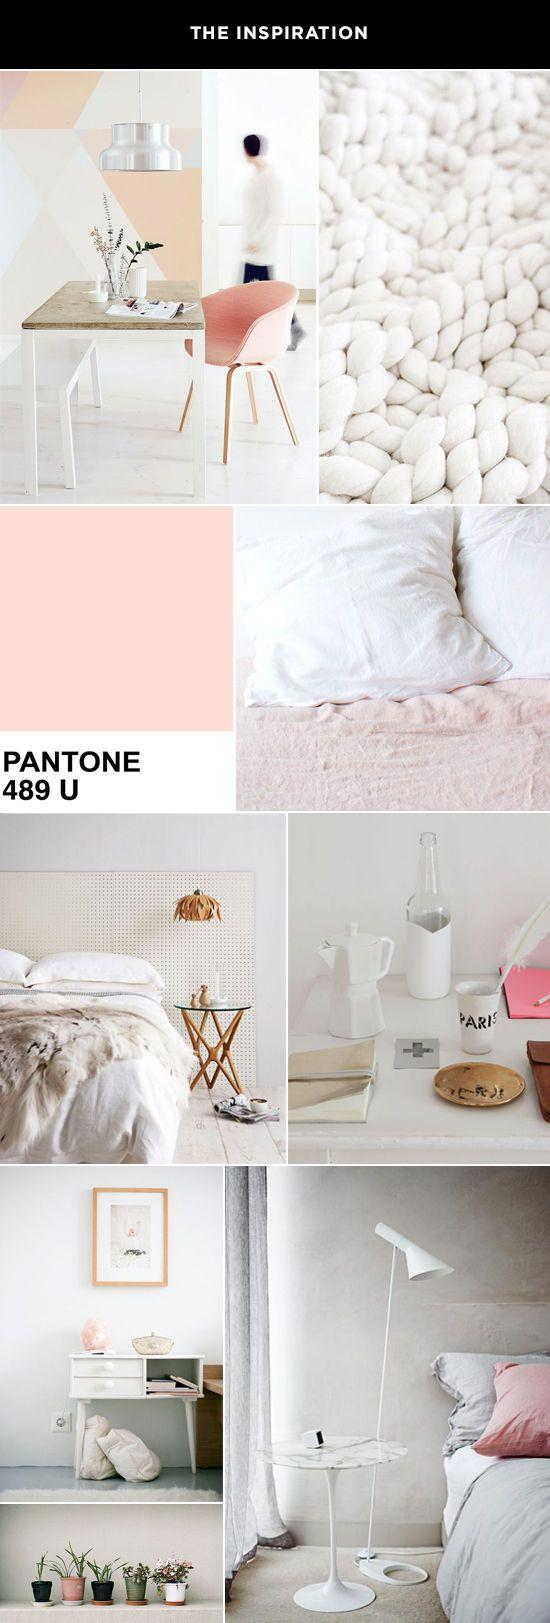 designlovefest bedroom makeover with sfgirlbybay | designlovefest